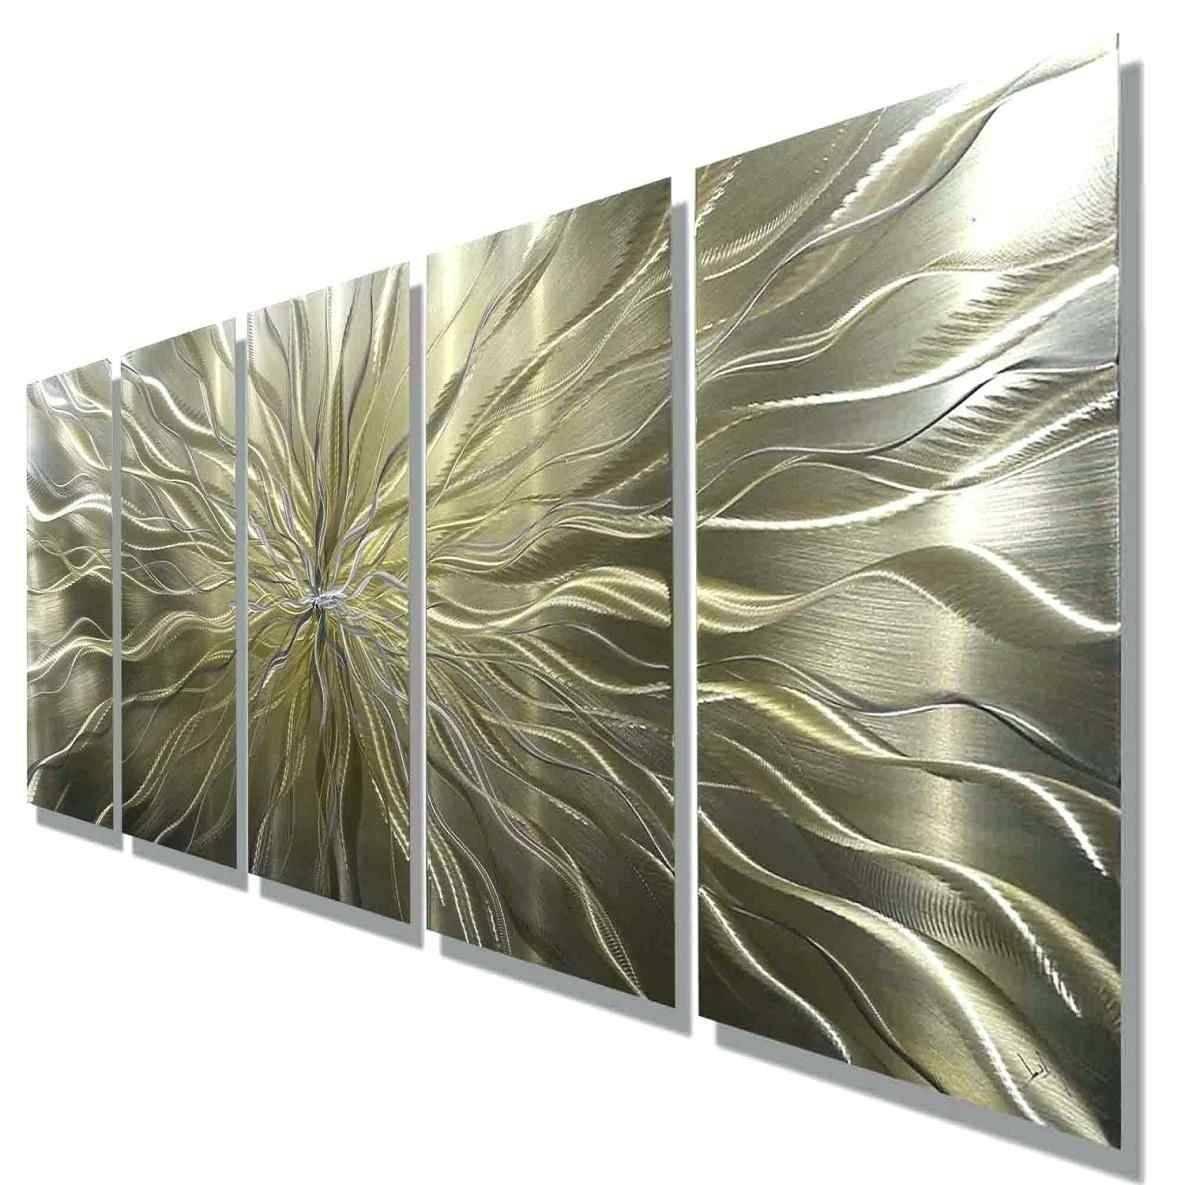 Modern Wall Abstract Metal Wall Art Uk Ideas Metal Abstract Art Throughout Most Recent Modern Wall Art Uk (View 6 of 20)